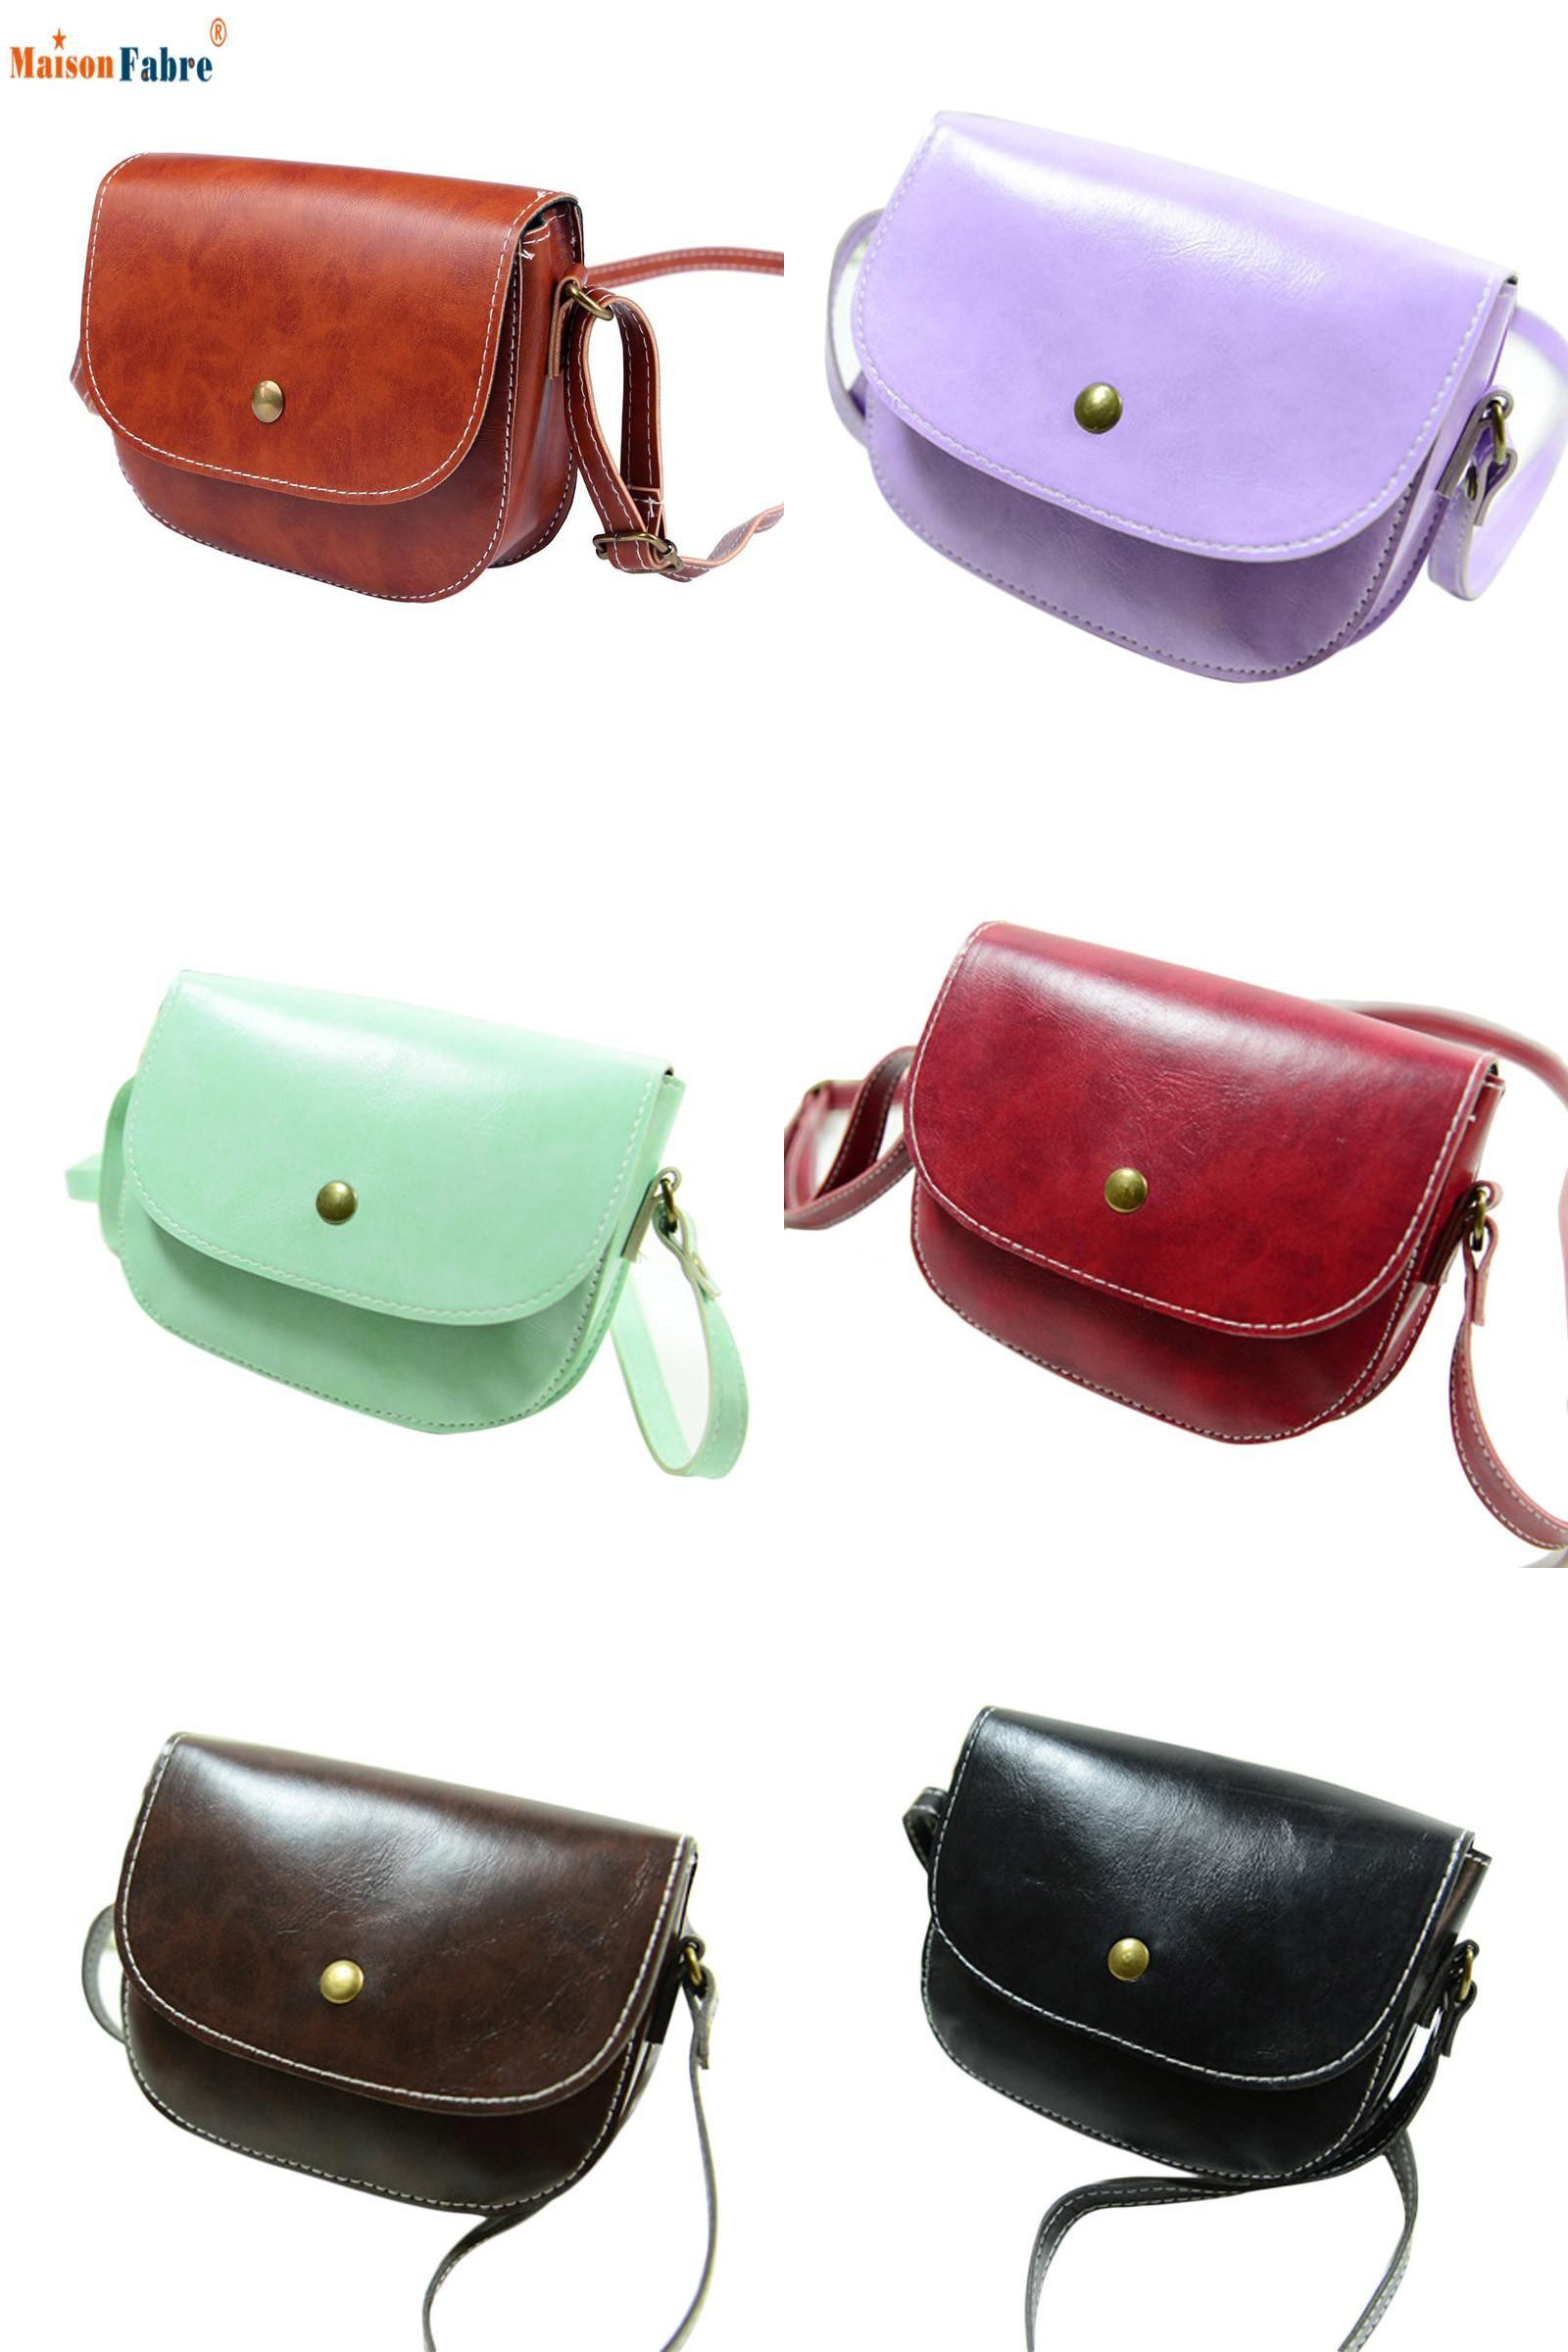 e4239097c9  Visit to Buy  Women Girls New Fashion Zero Purse Bag Pu Leather Retro  Vintage